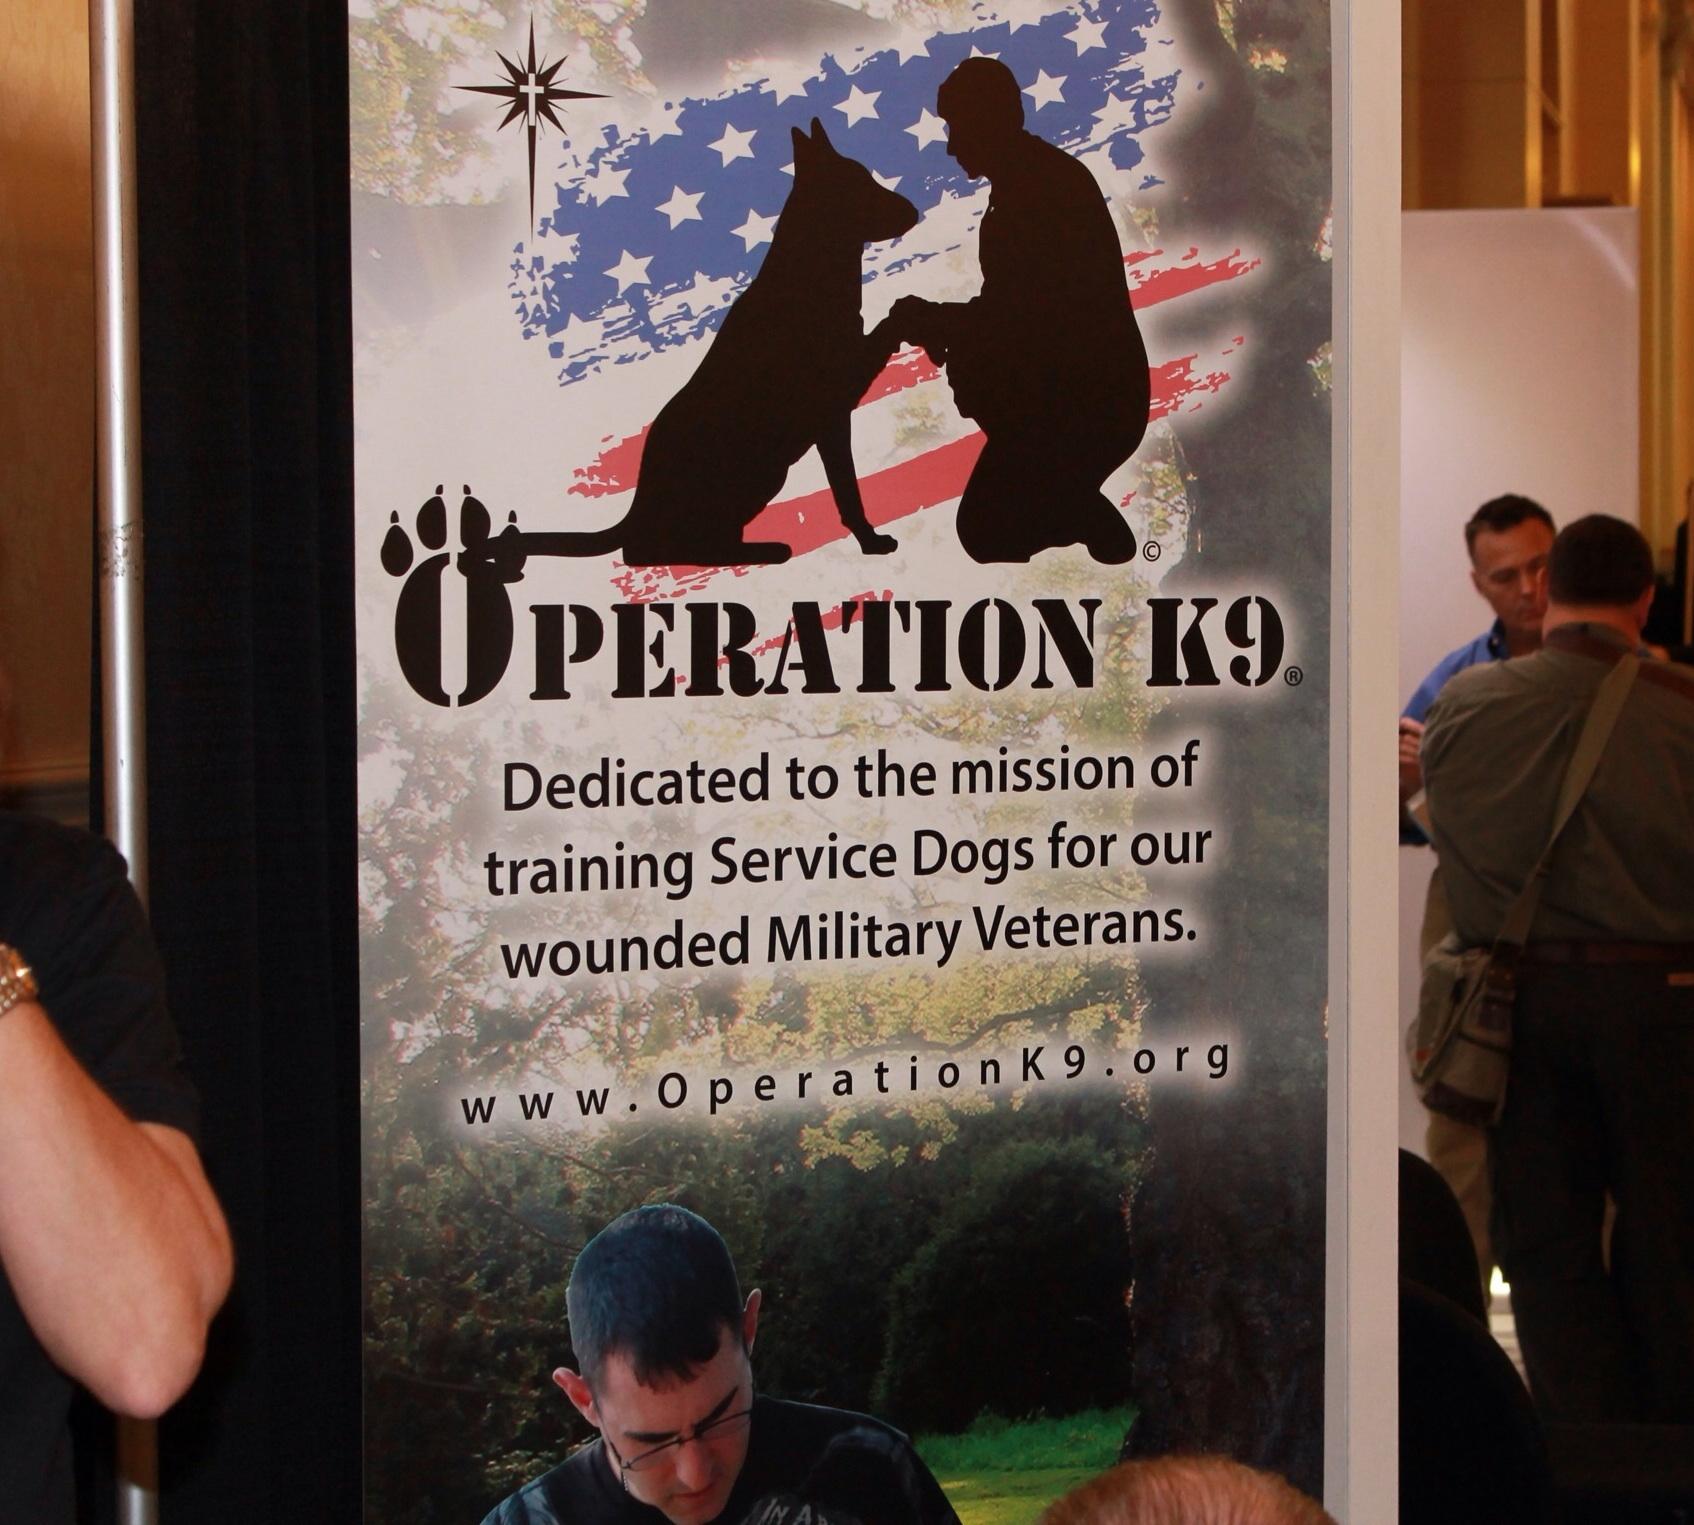 Operation K9